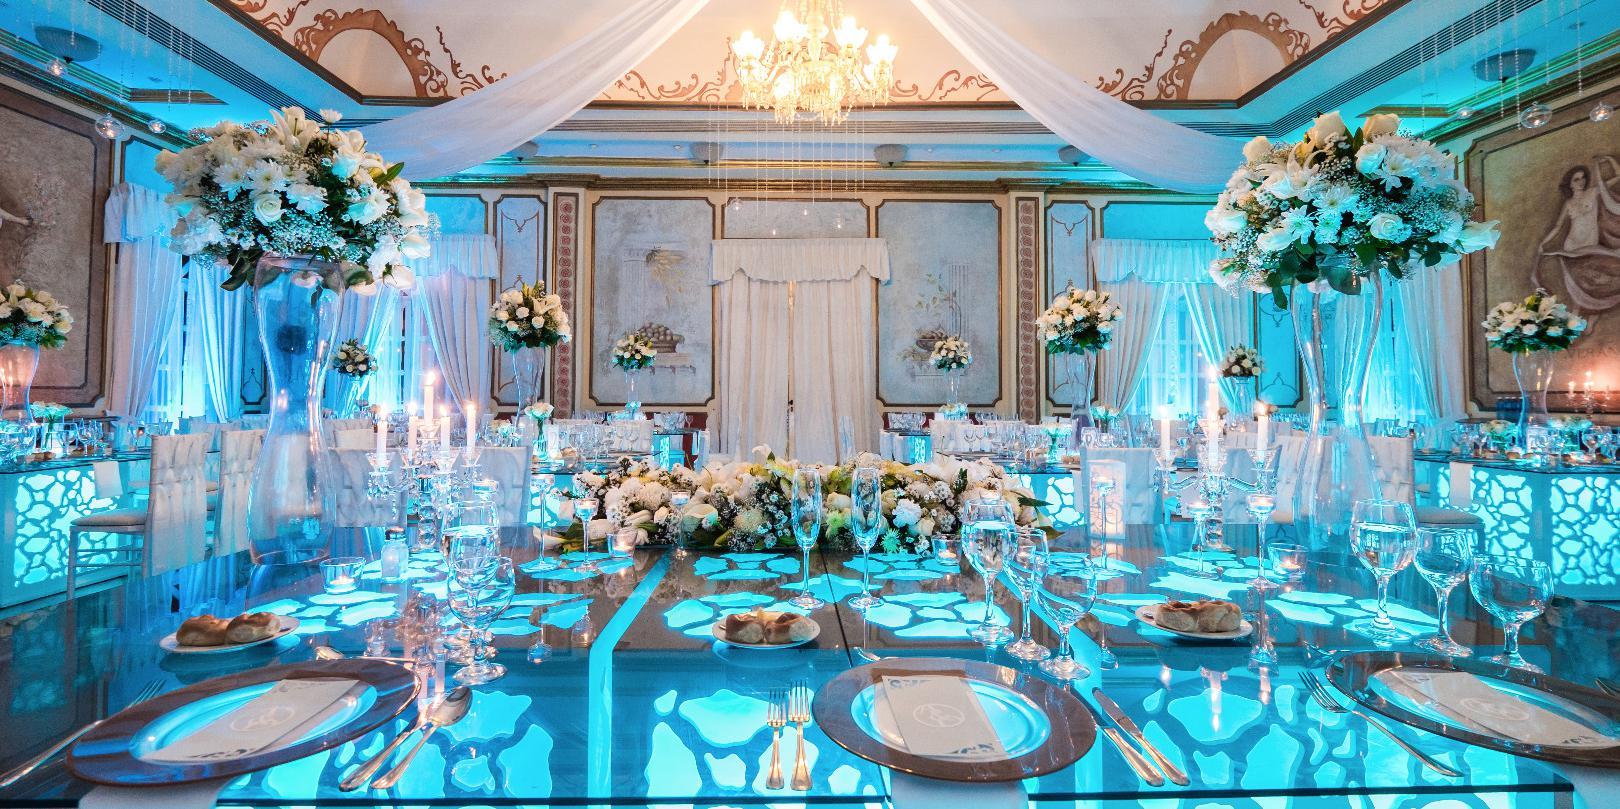 bodas-sin-clasificar-sin-tema-cuba-30831.jpg